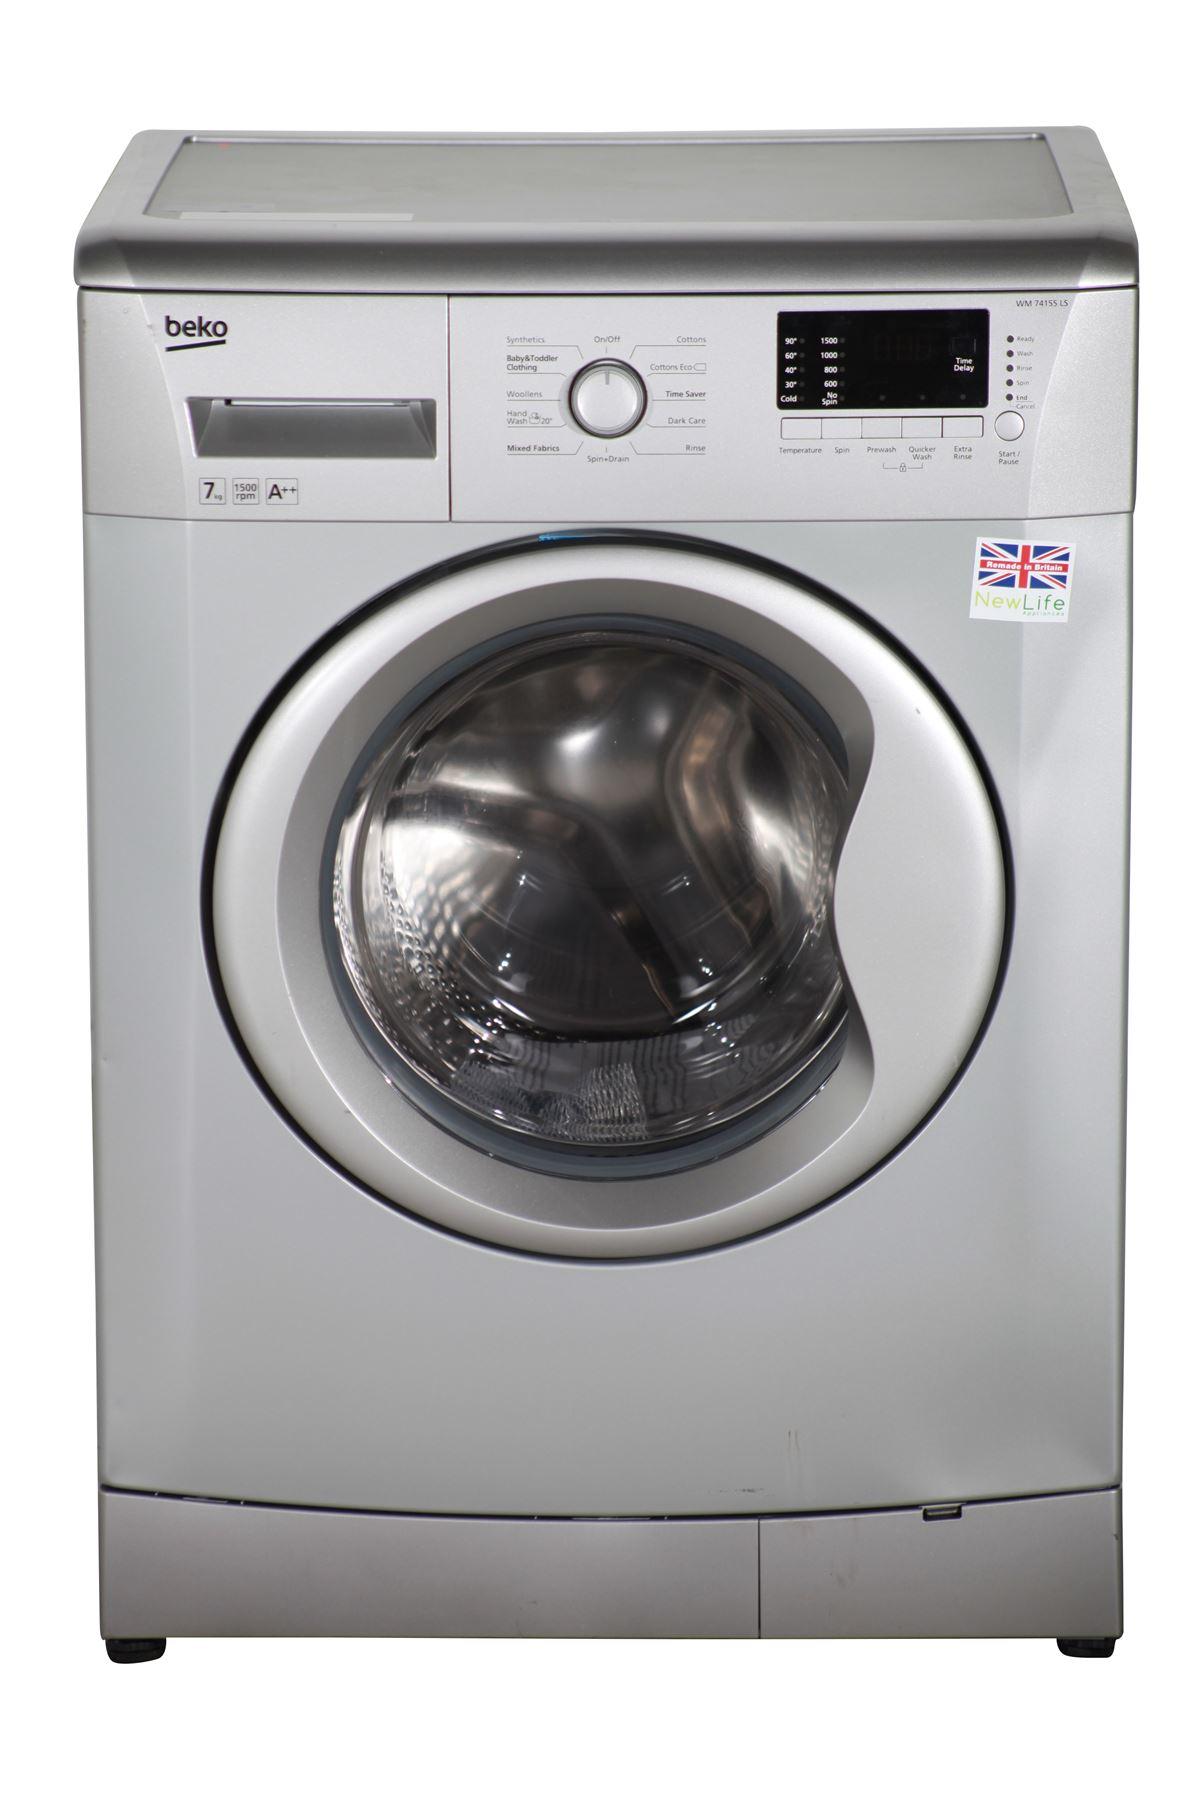 preloved beko 7kg washing machine 1500spin wm74155ls. Black Bedroom Furniture Sets. Home Design Ideas